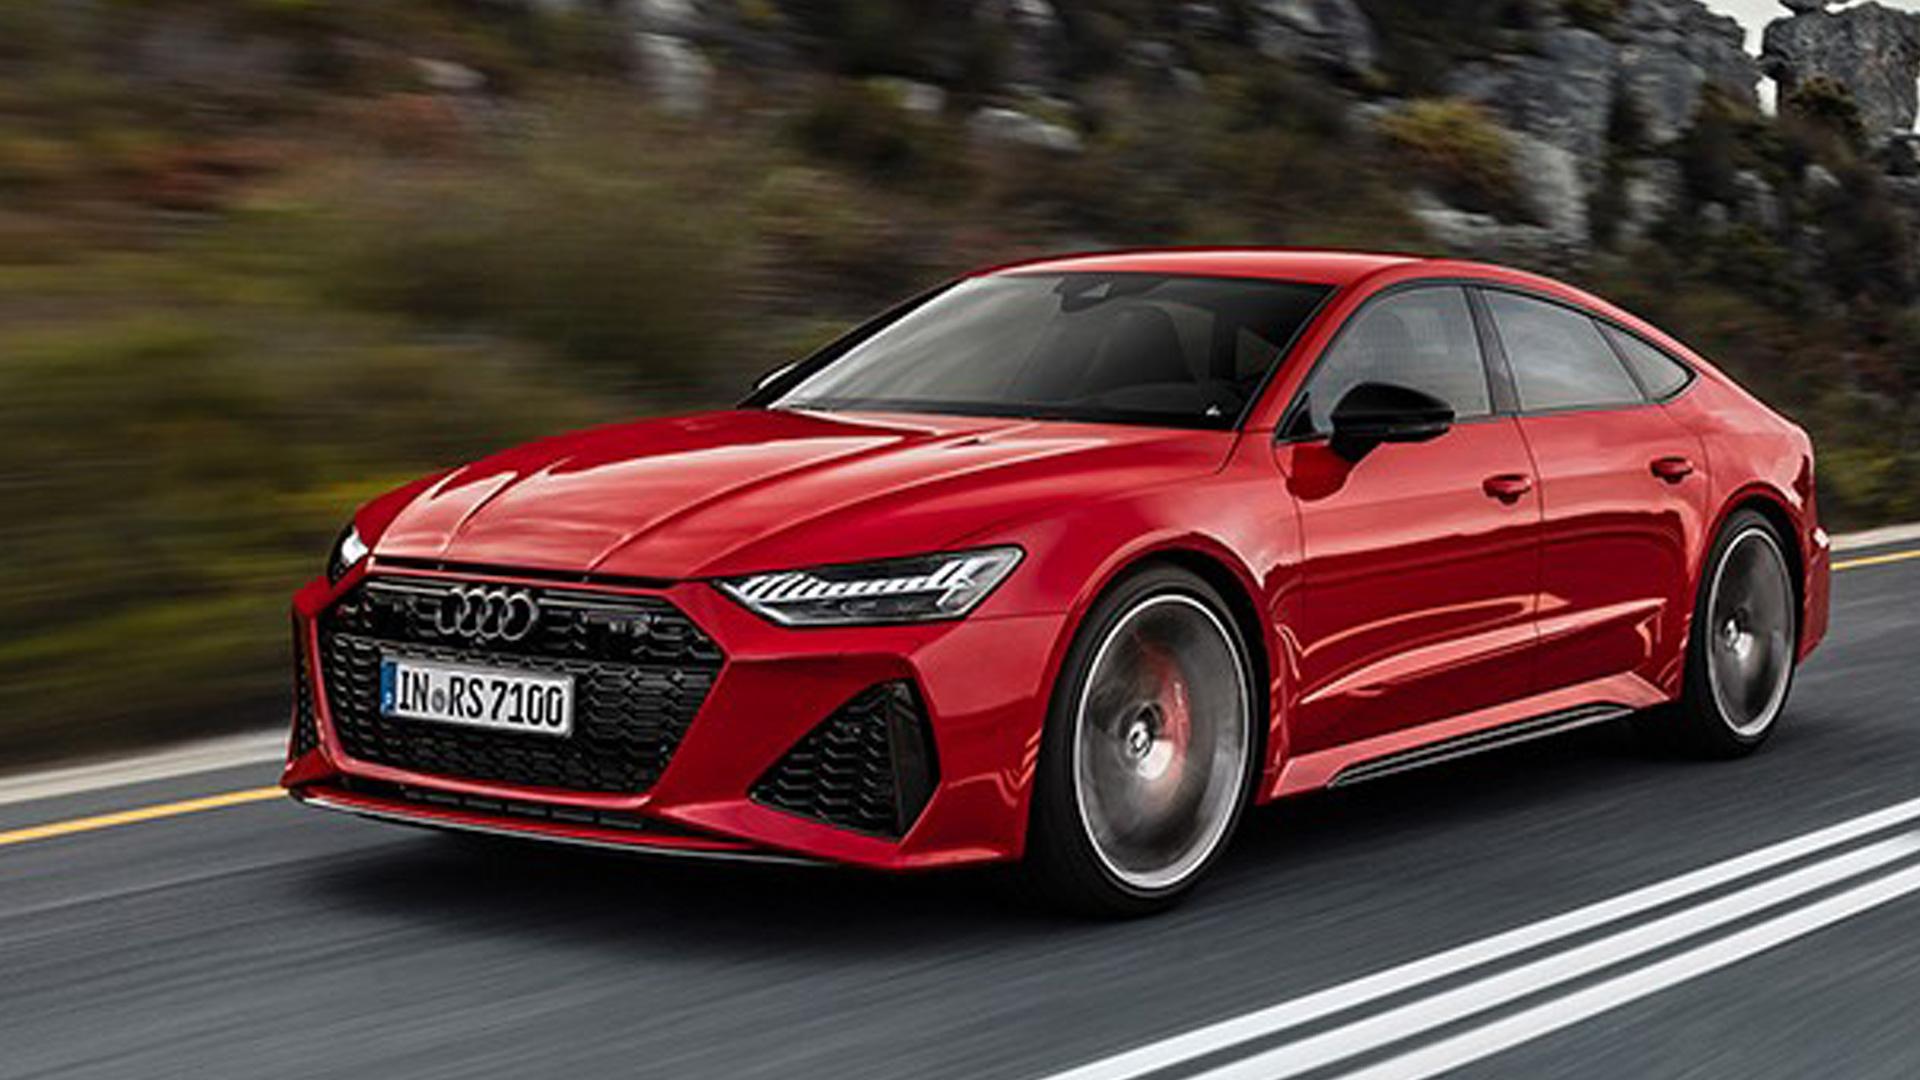 Audi RS 2020 Sportback Exterior